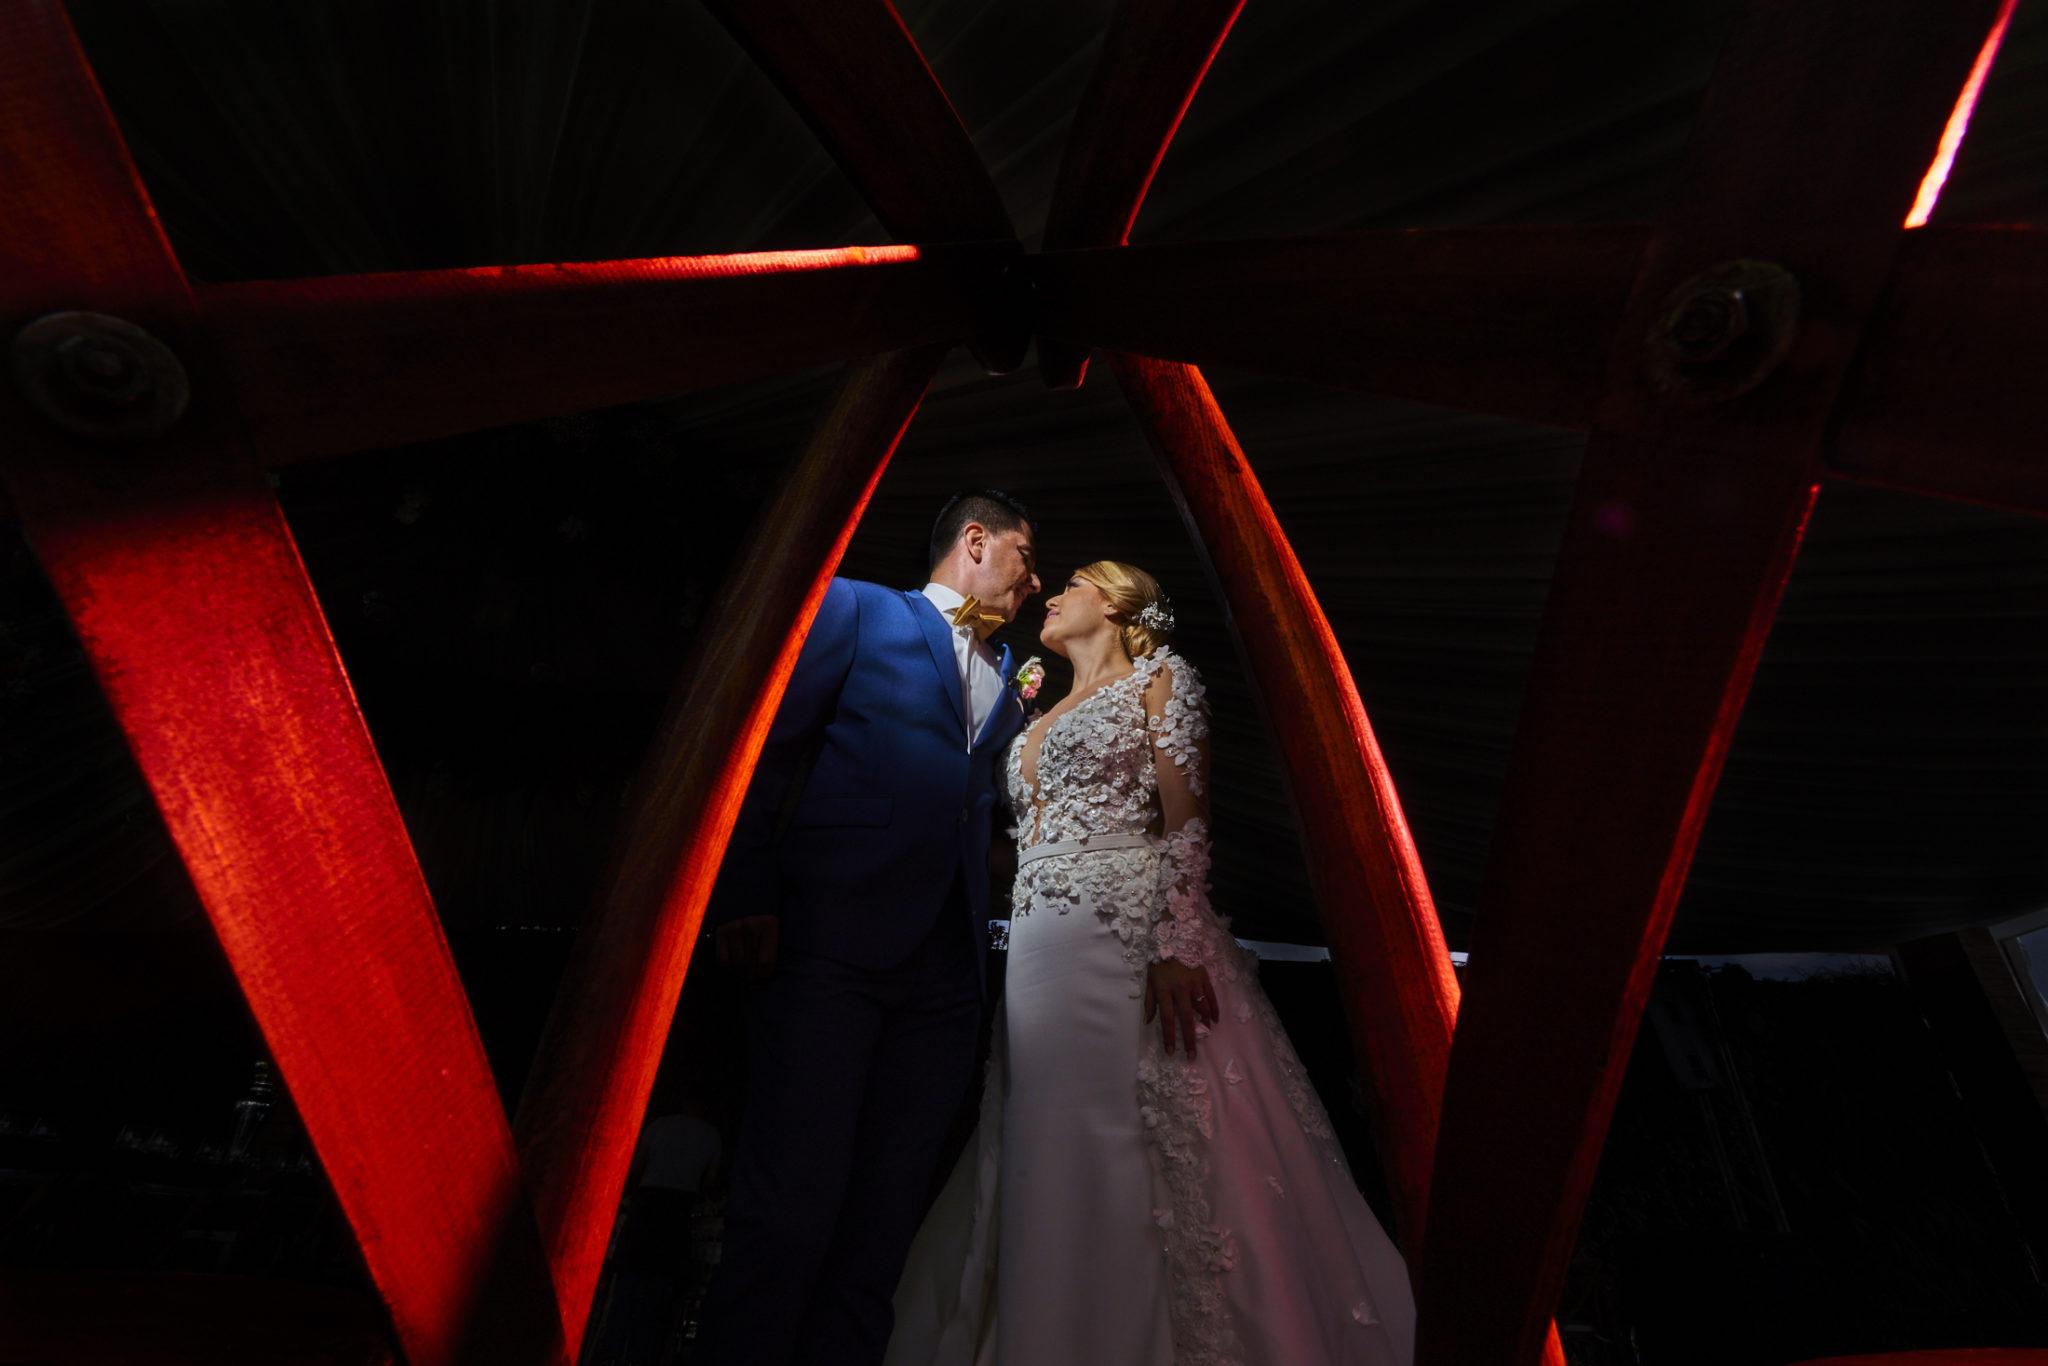 Sony A7iii wedding photography + RAW File sample » International